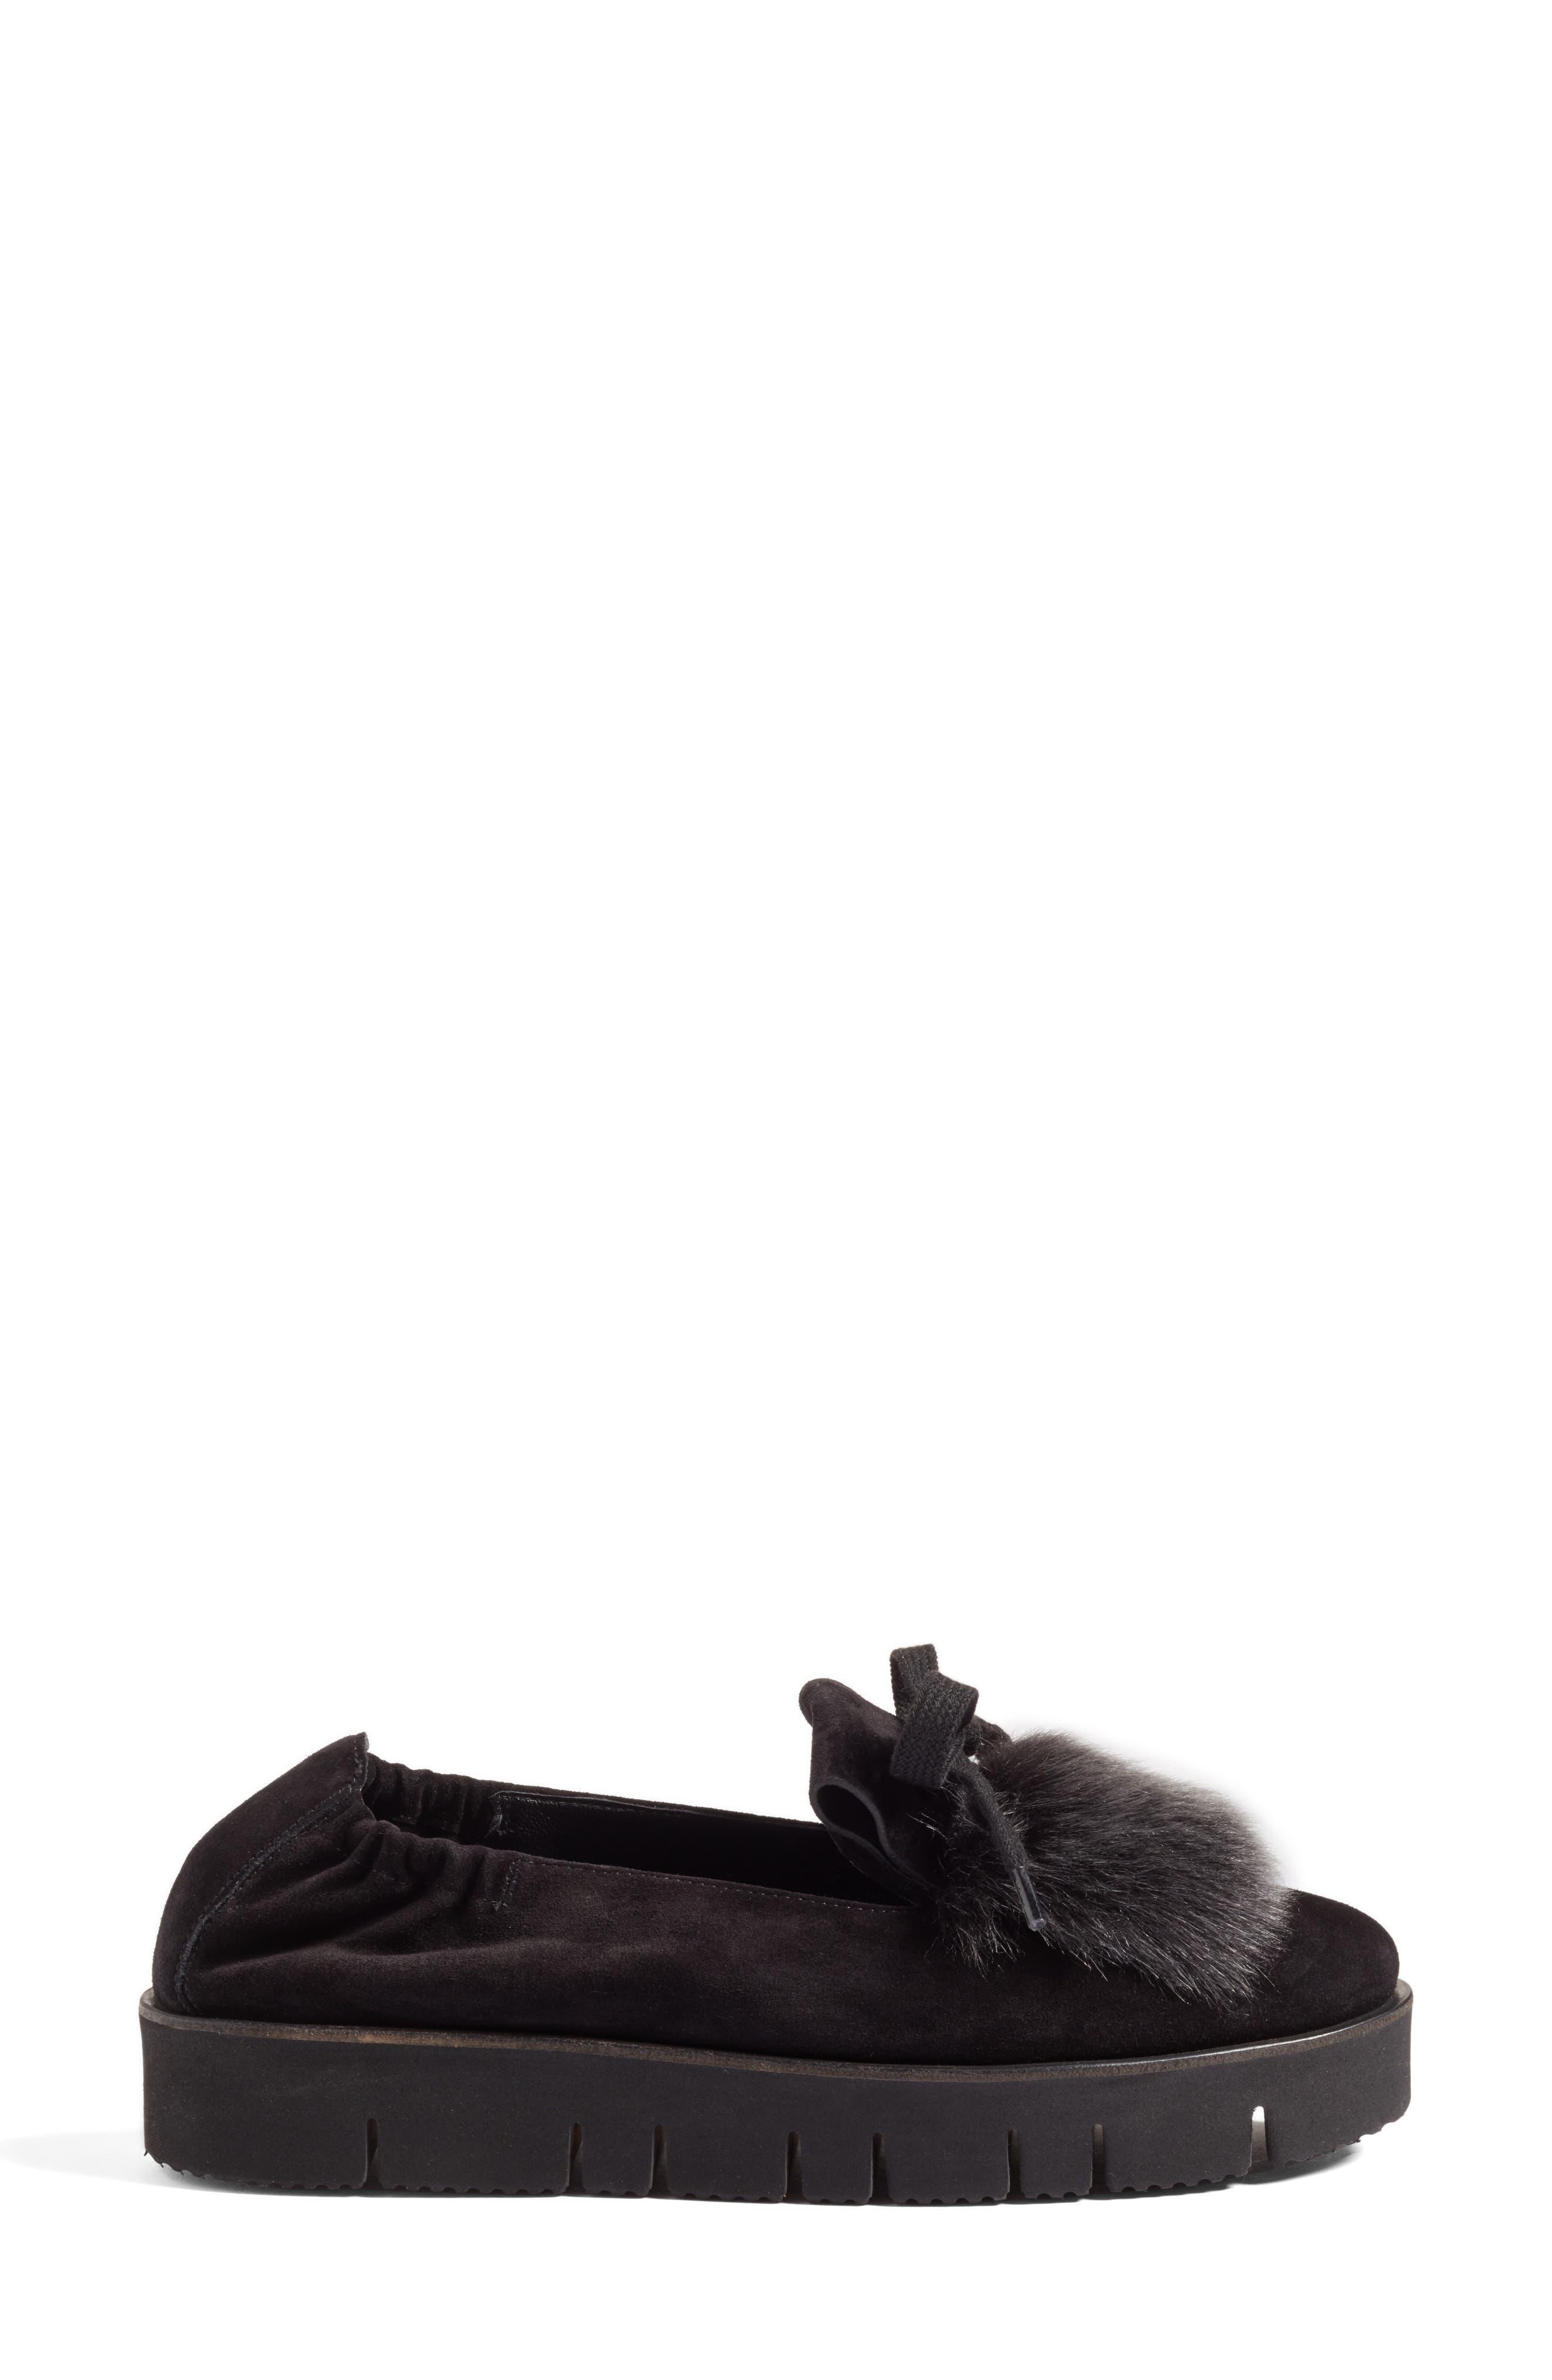 Kennel & Schmenger Malu Suede & Genuine Shearling Slip-On Sneaker,                             Alternate thumbnail 3, color,                             001